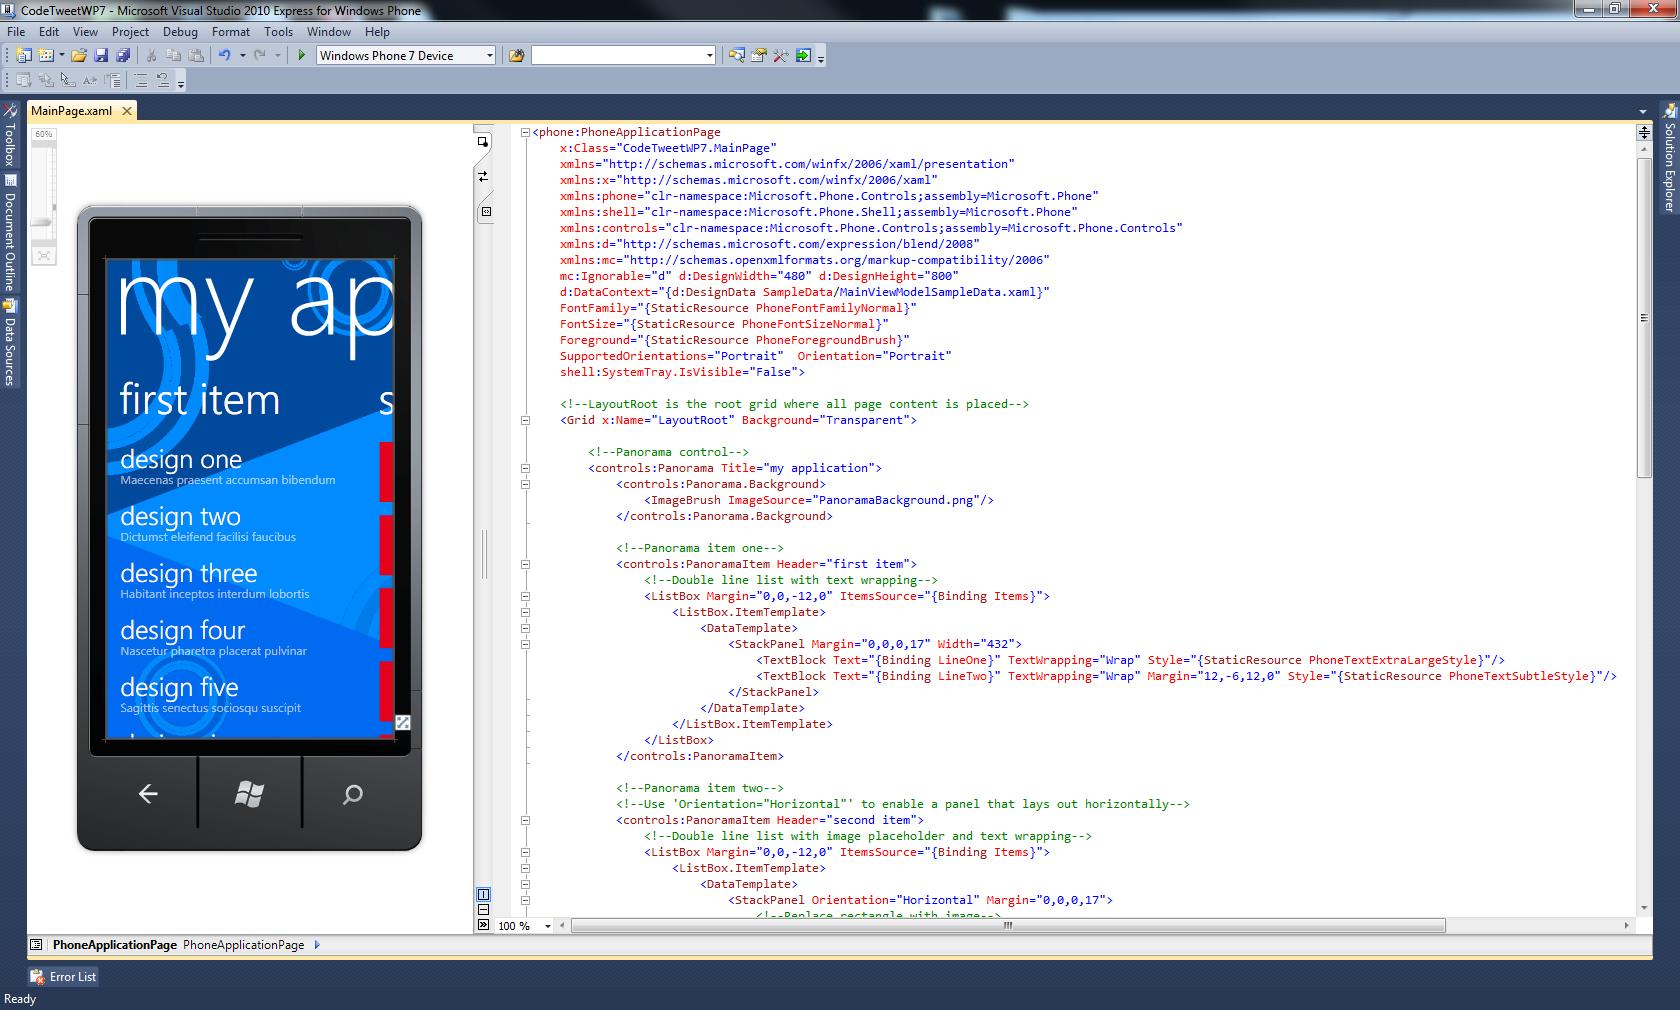 Building CodeTweet for Windows Phone